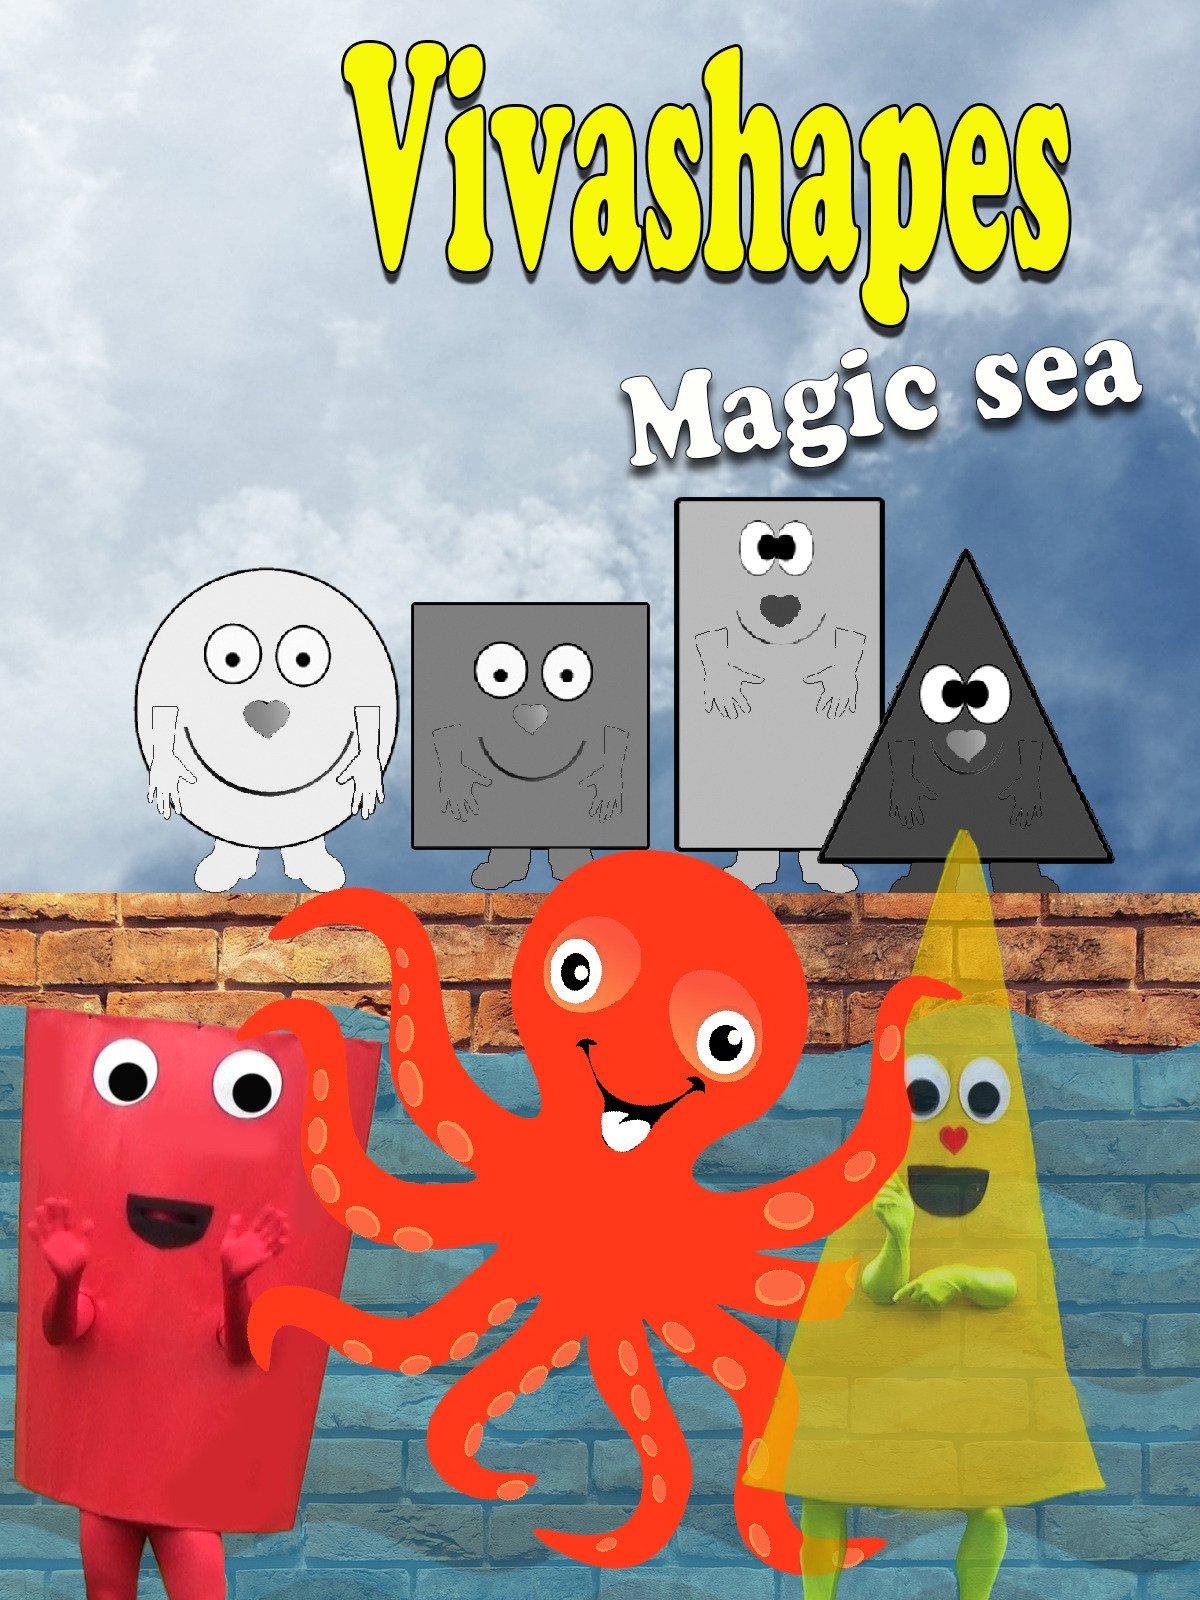 Vivashapes Magic sea.